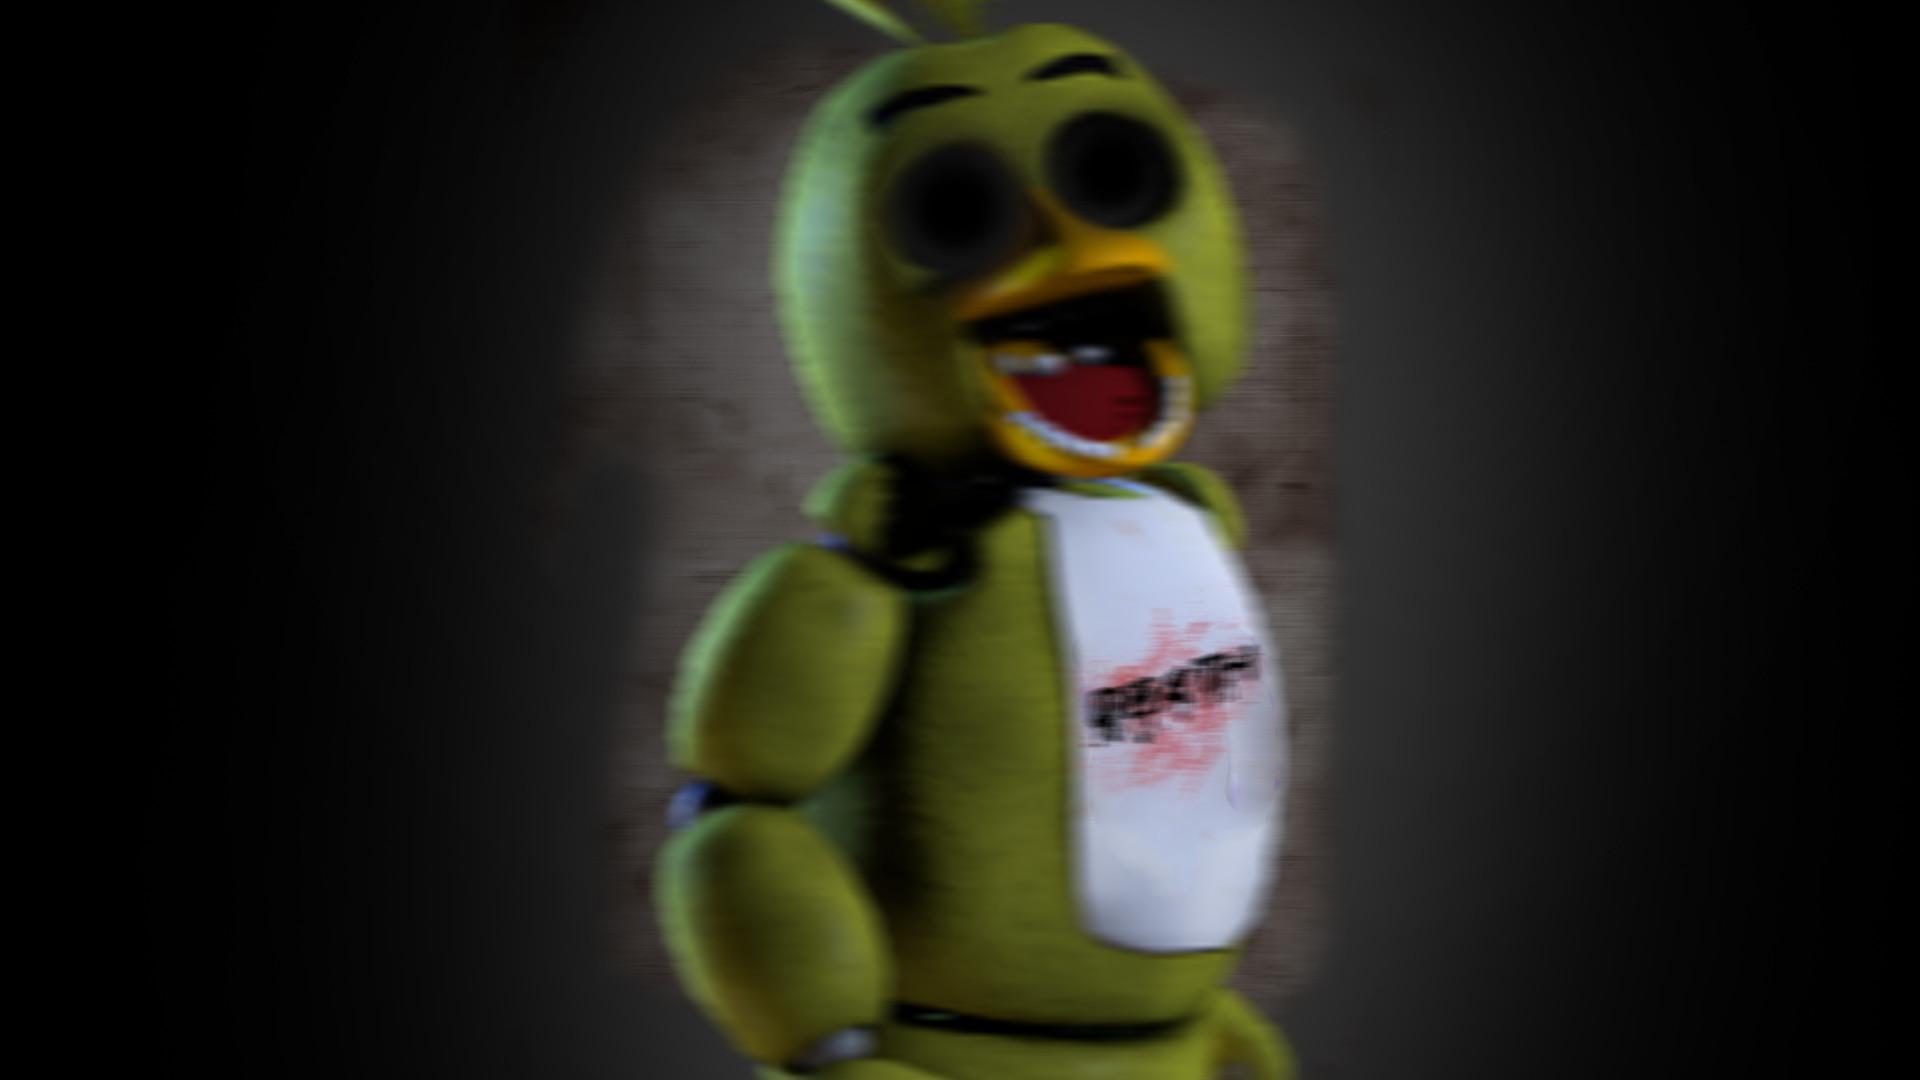 … Five Nights at Freddy's Wallpaper 2 by KirbyKillUGFX